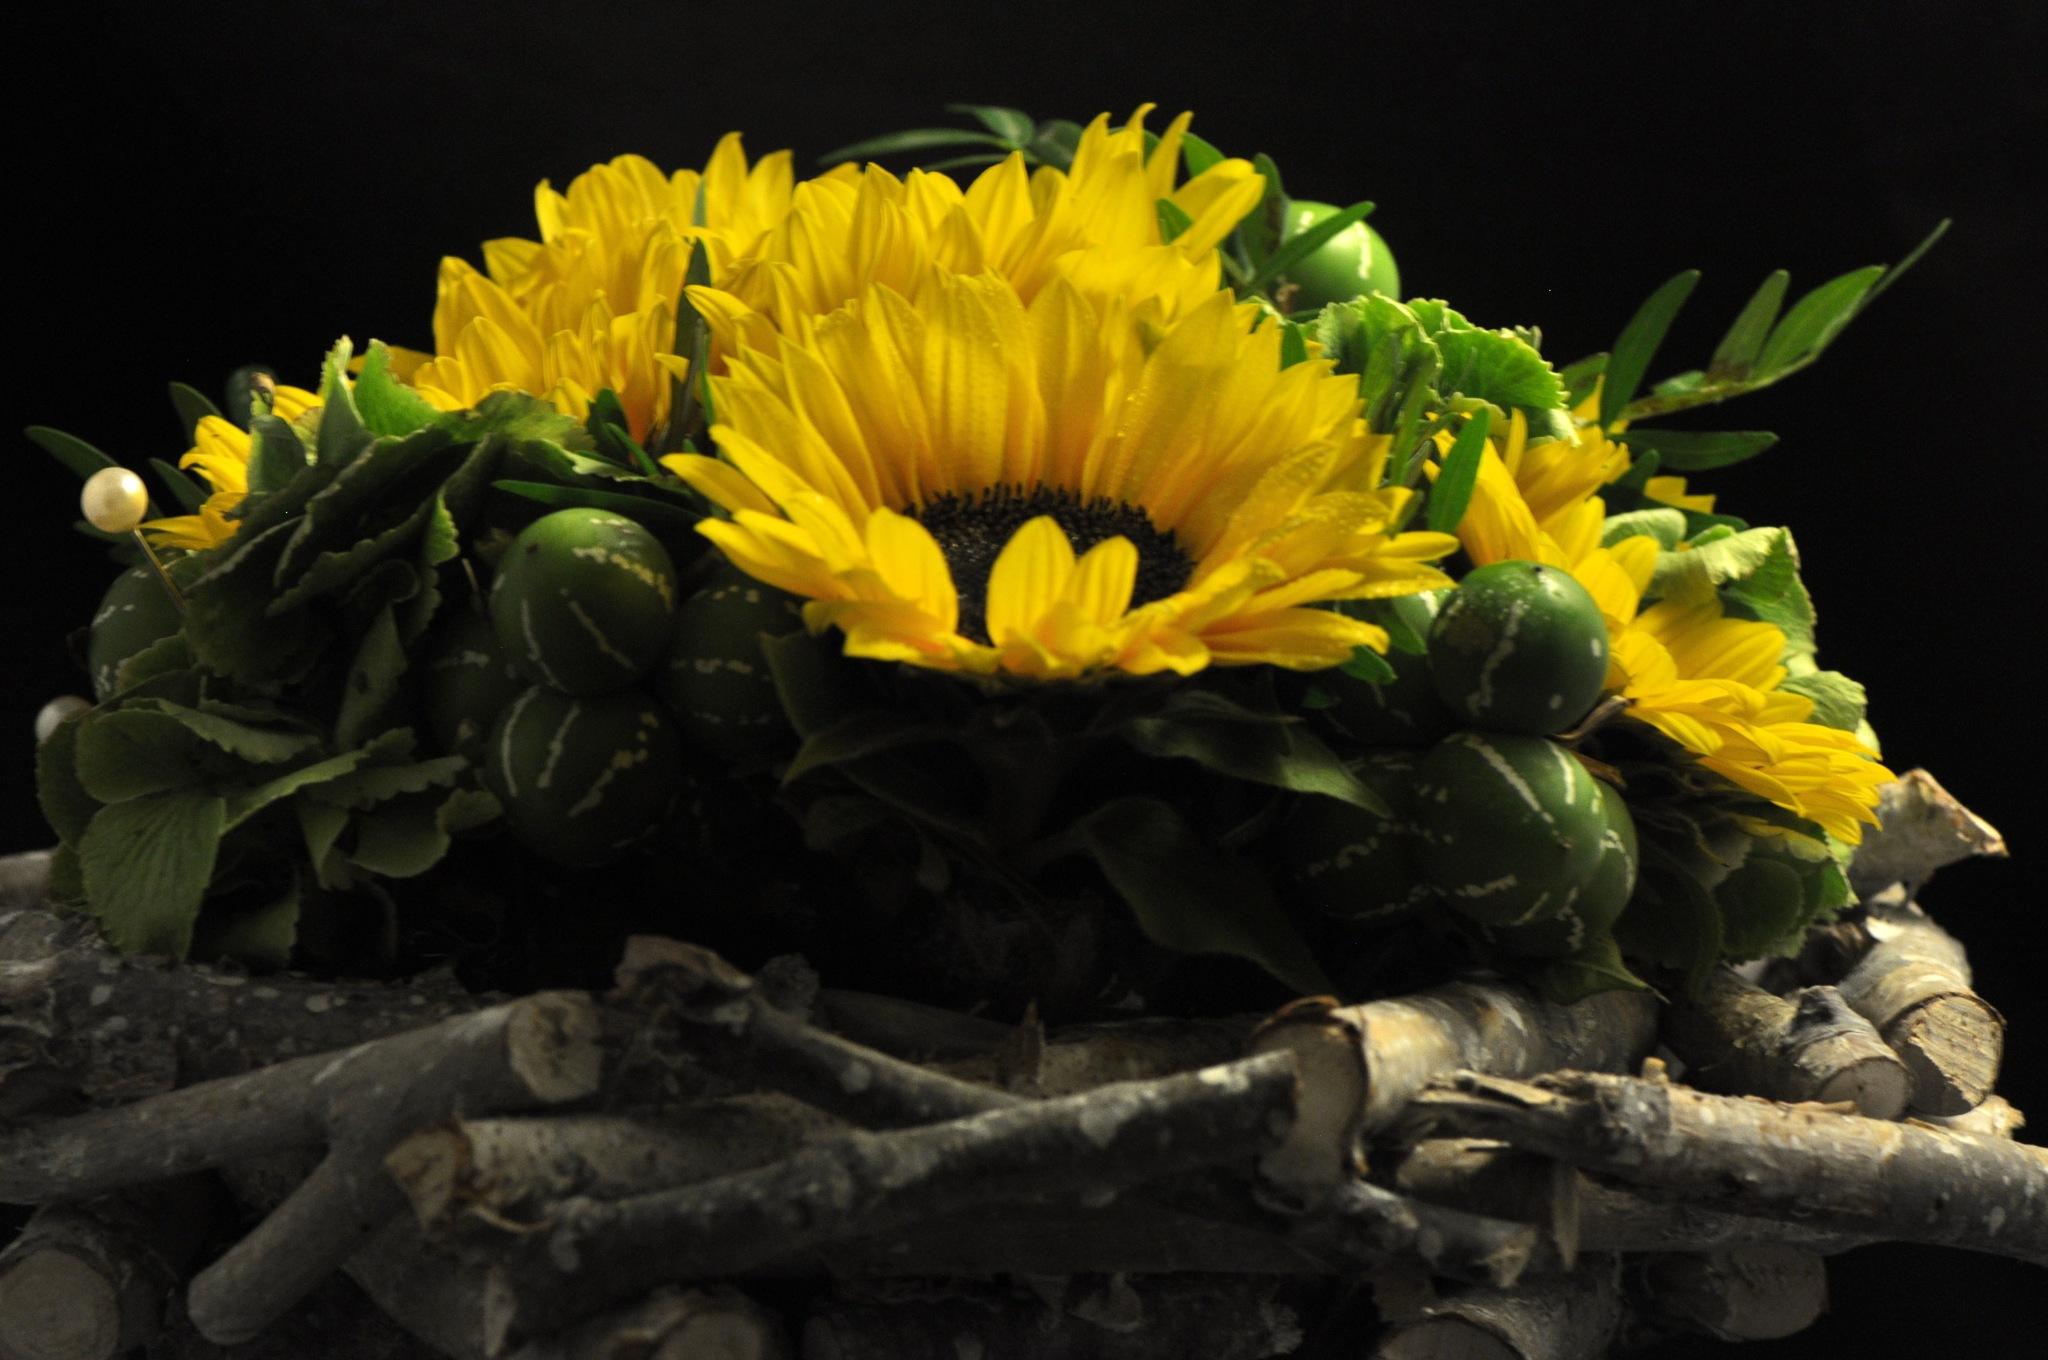 sunflowers by paul wante